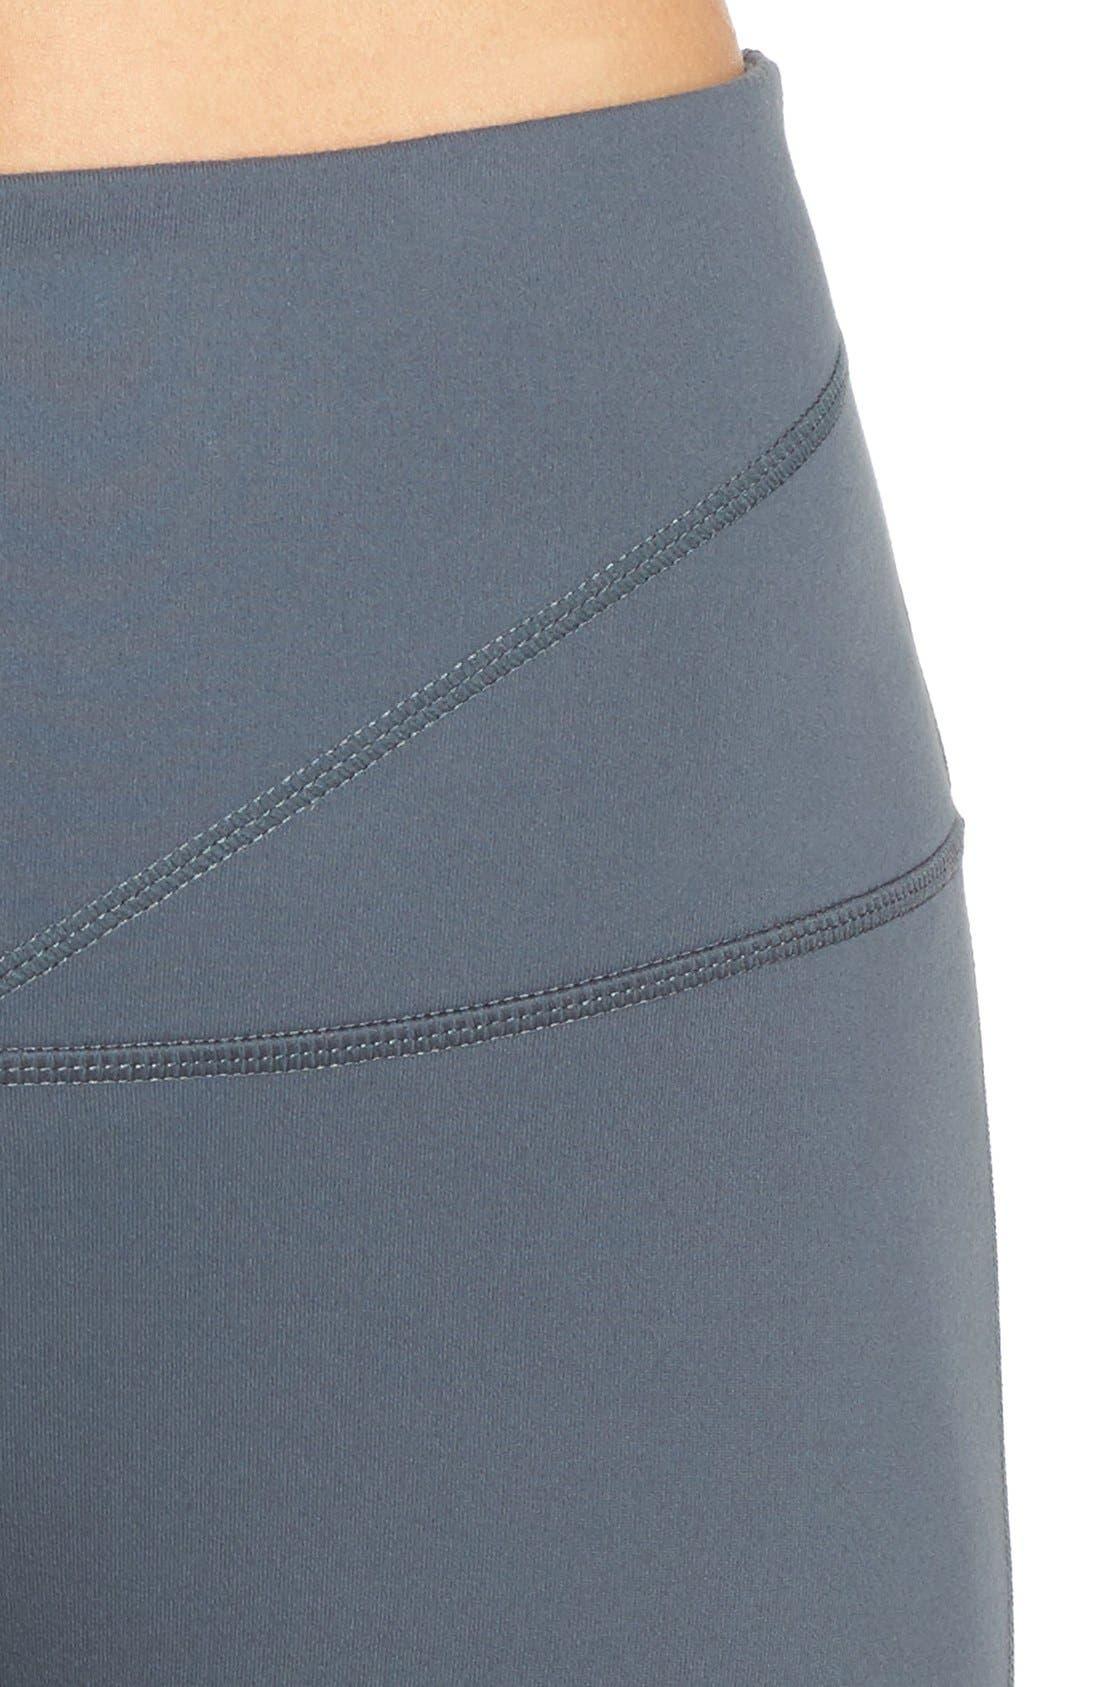 Alternate Image 4  - Zella 'Midnight' High Waist Cutout Midi Leggings